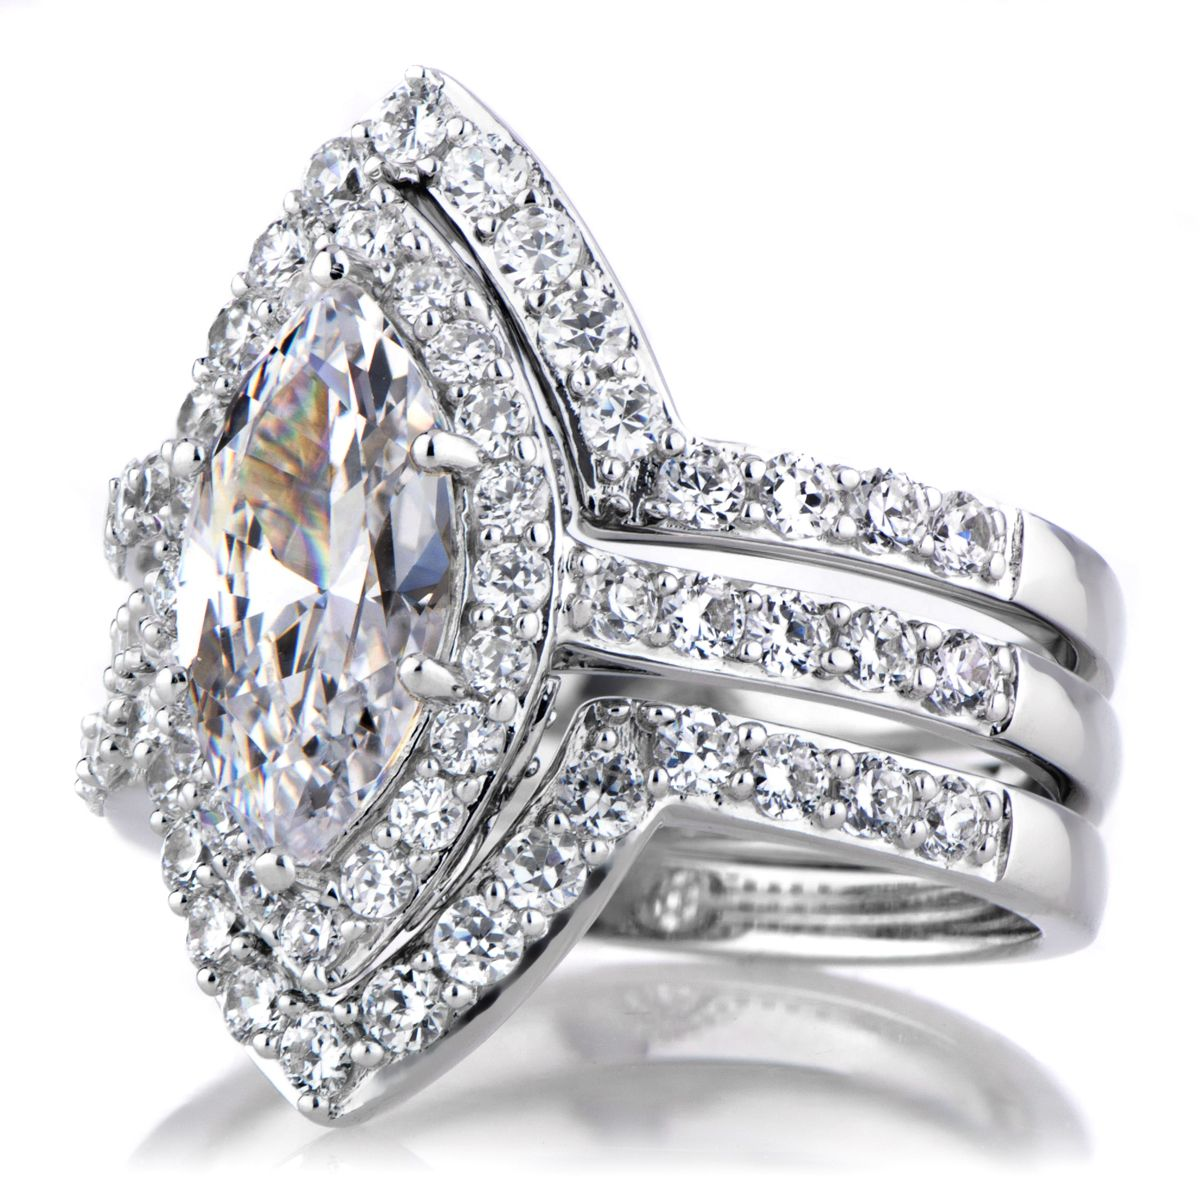 Pin by Lynn's Southern Heart on Bling | Diamond wedding ...